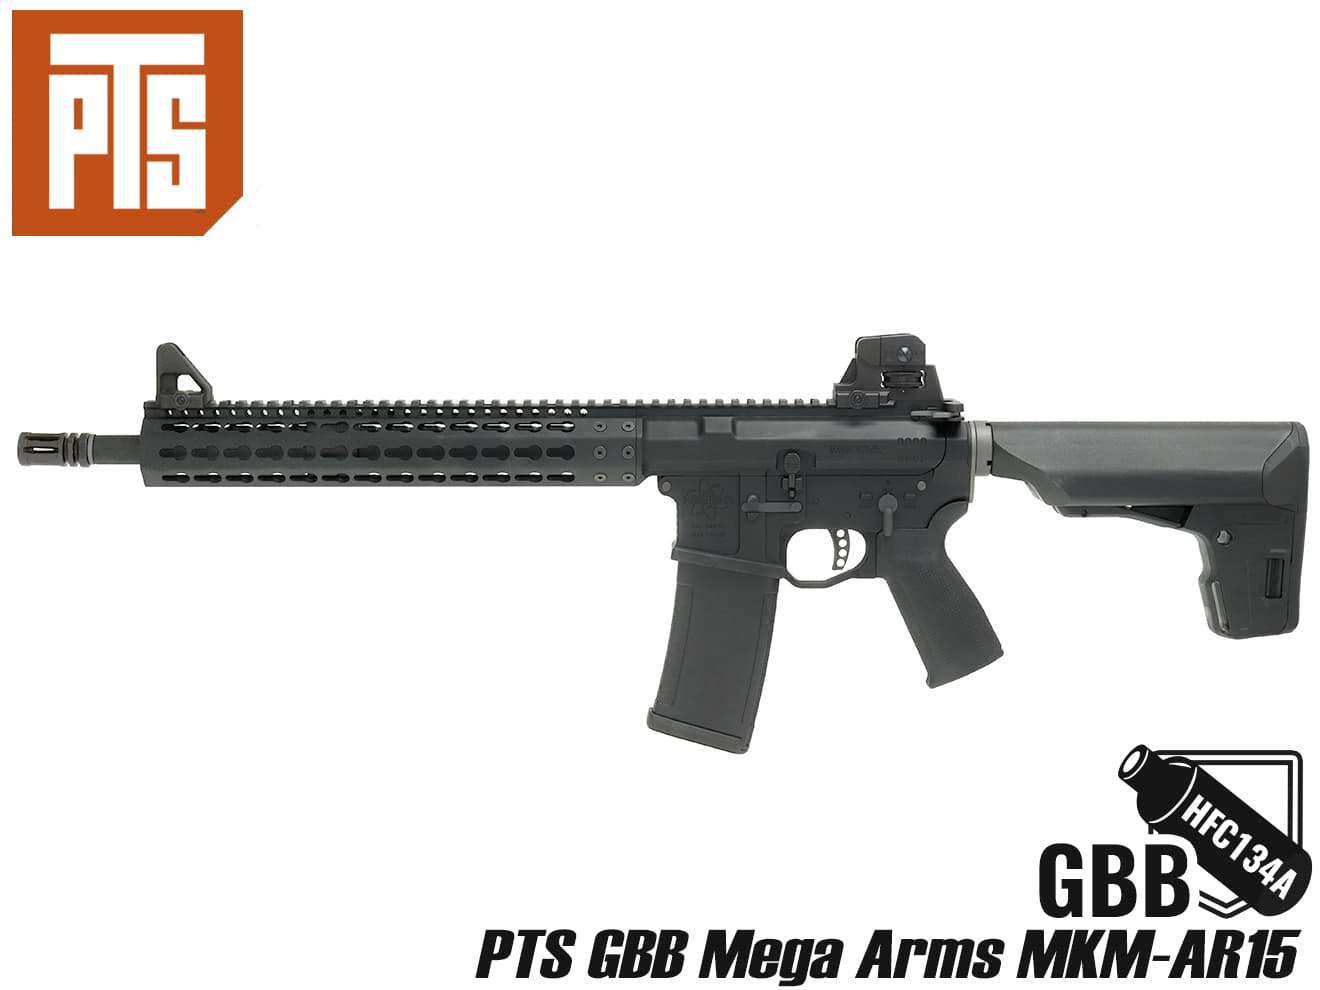 PTS Mega Arms MKM-AR15 GBB(KSCエンジン搭載)◆ガスブローバック MEGA ARMS正規ライセンス取得 ビレットレシーバー 高剛性/高精度 BK